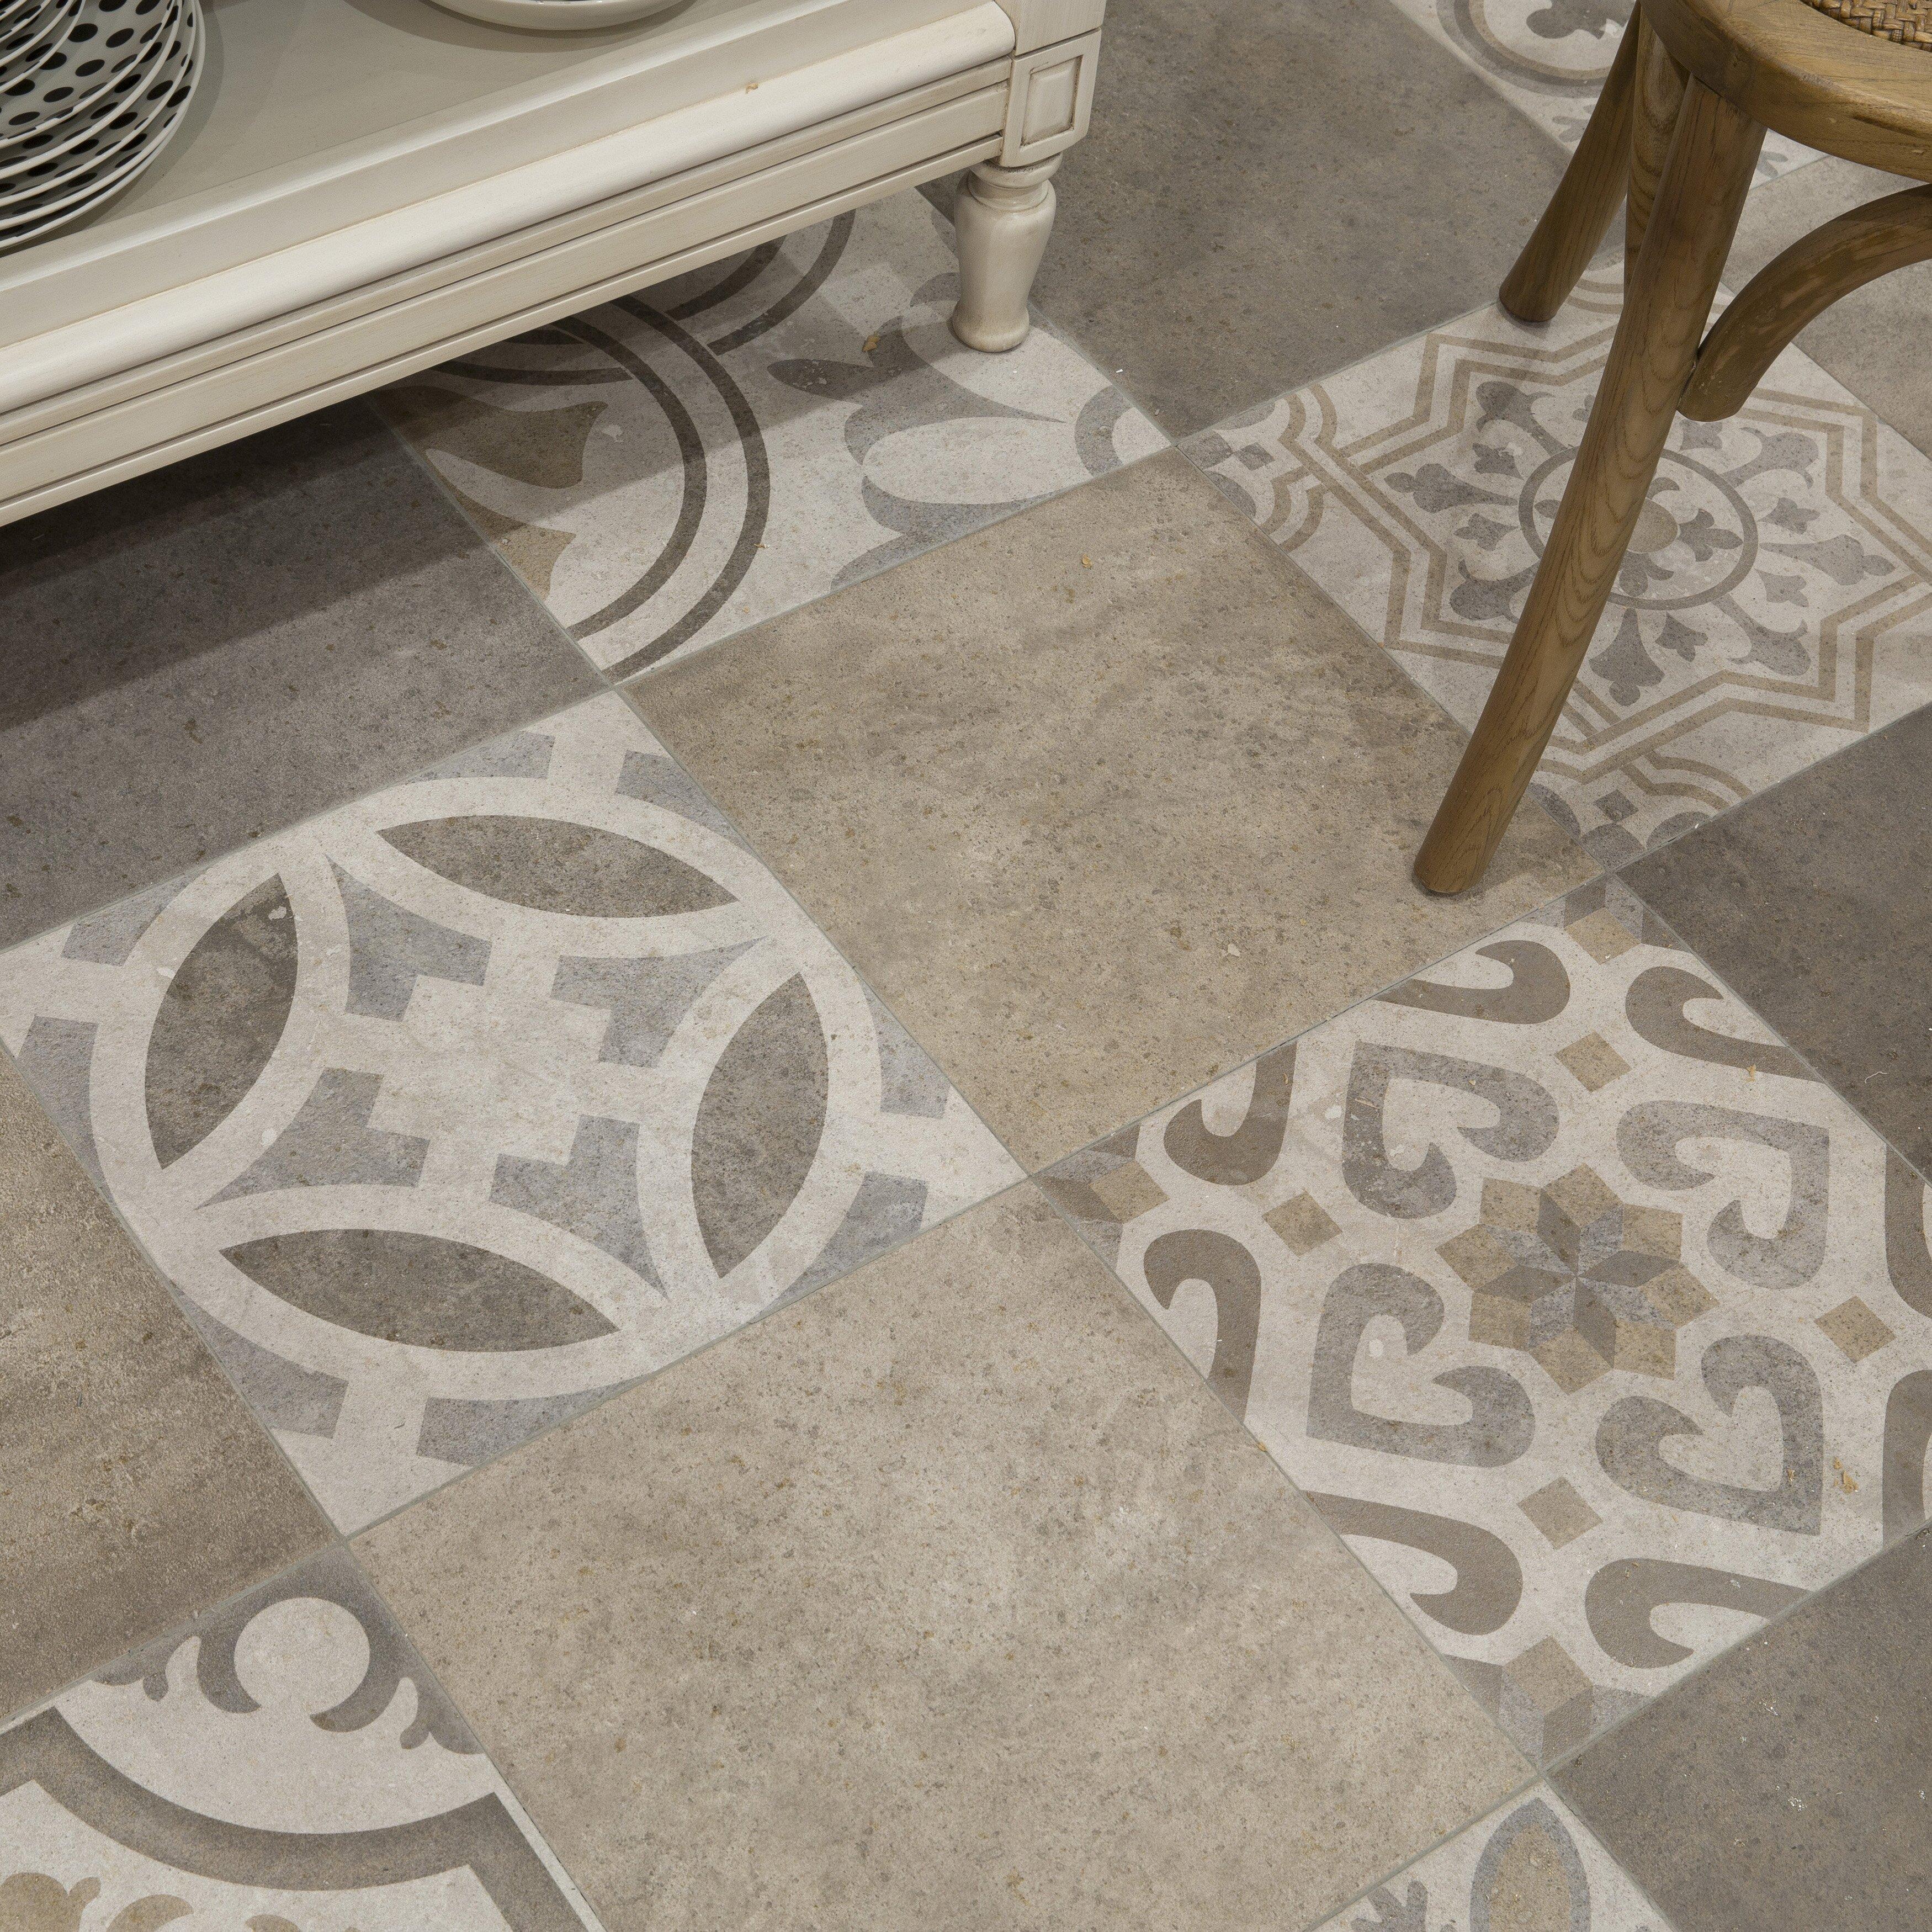 Elitetile ardisana x ceramic field tile in for 13 inch ceramic floor tile